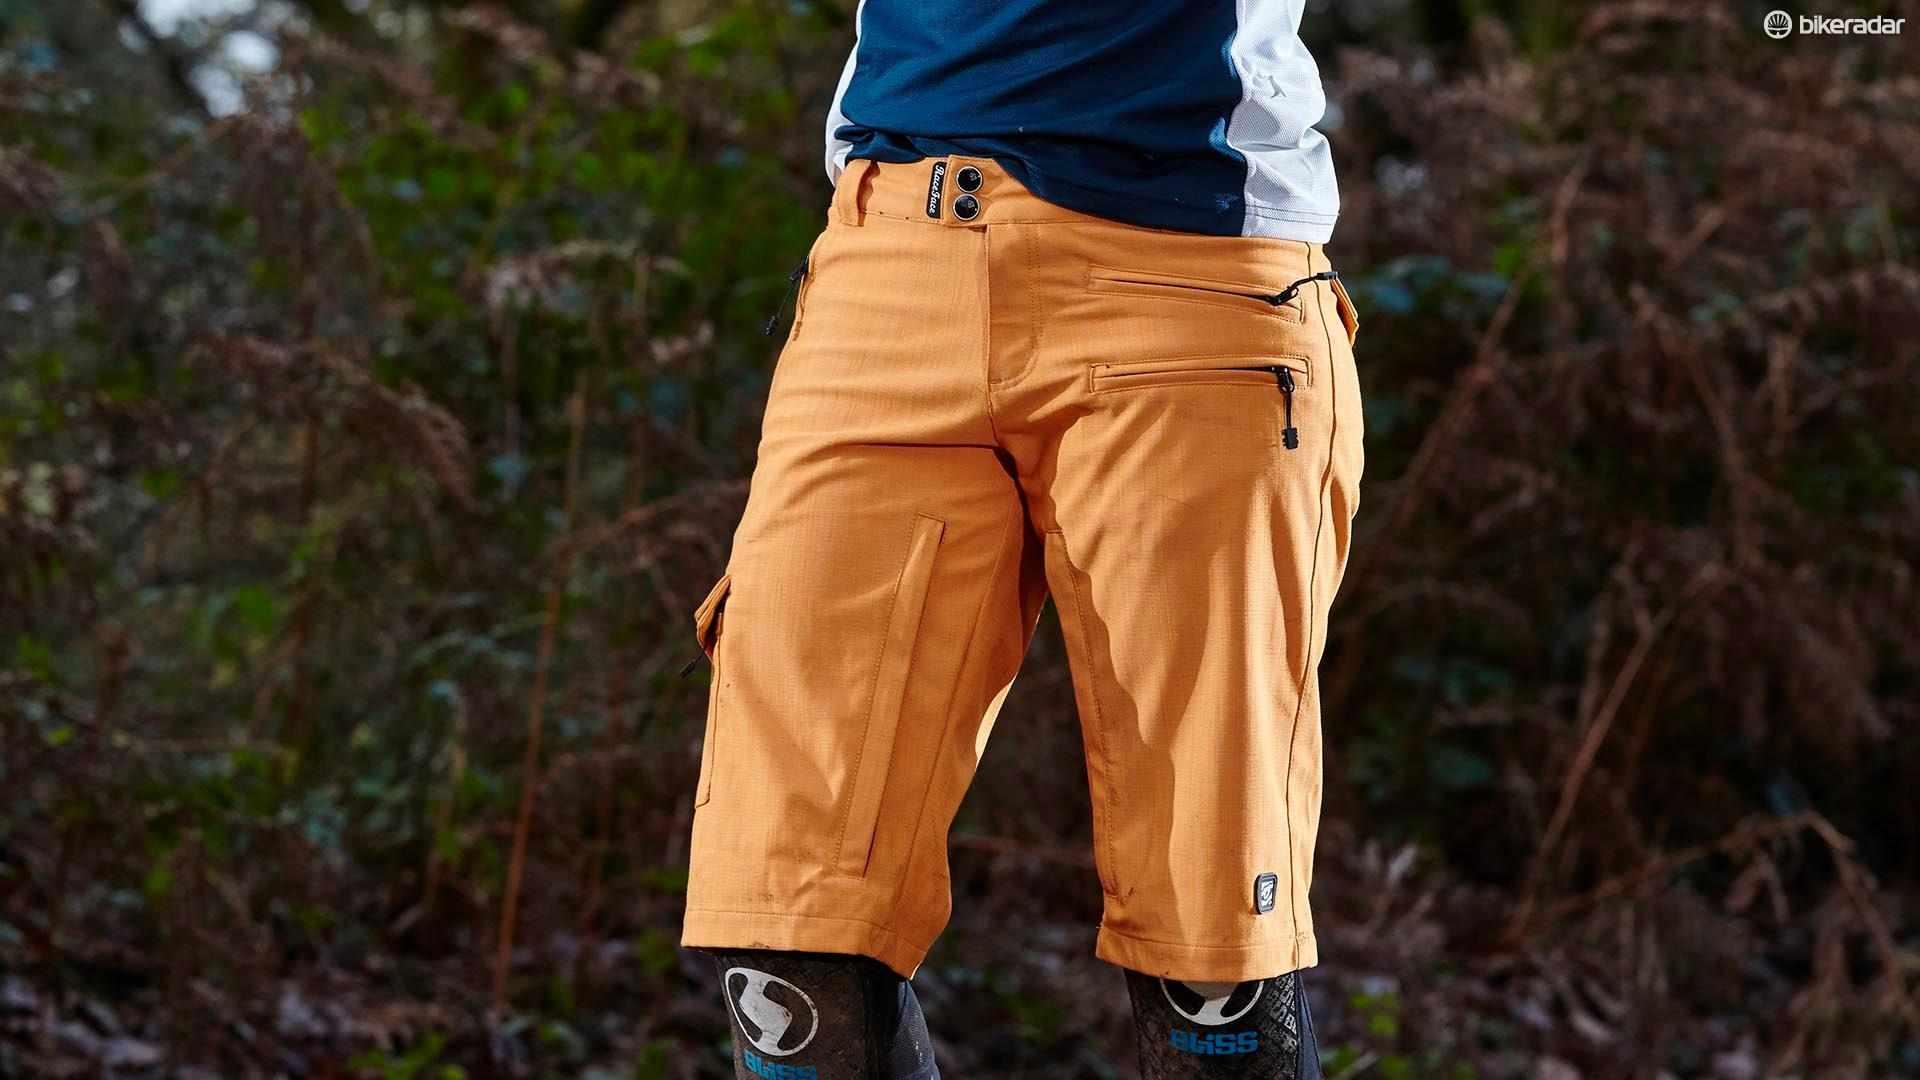 Race Face's women-specific Khyber MTB shorts